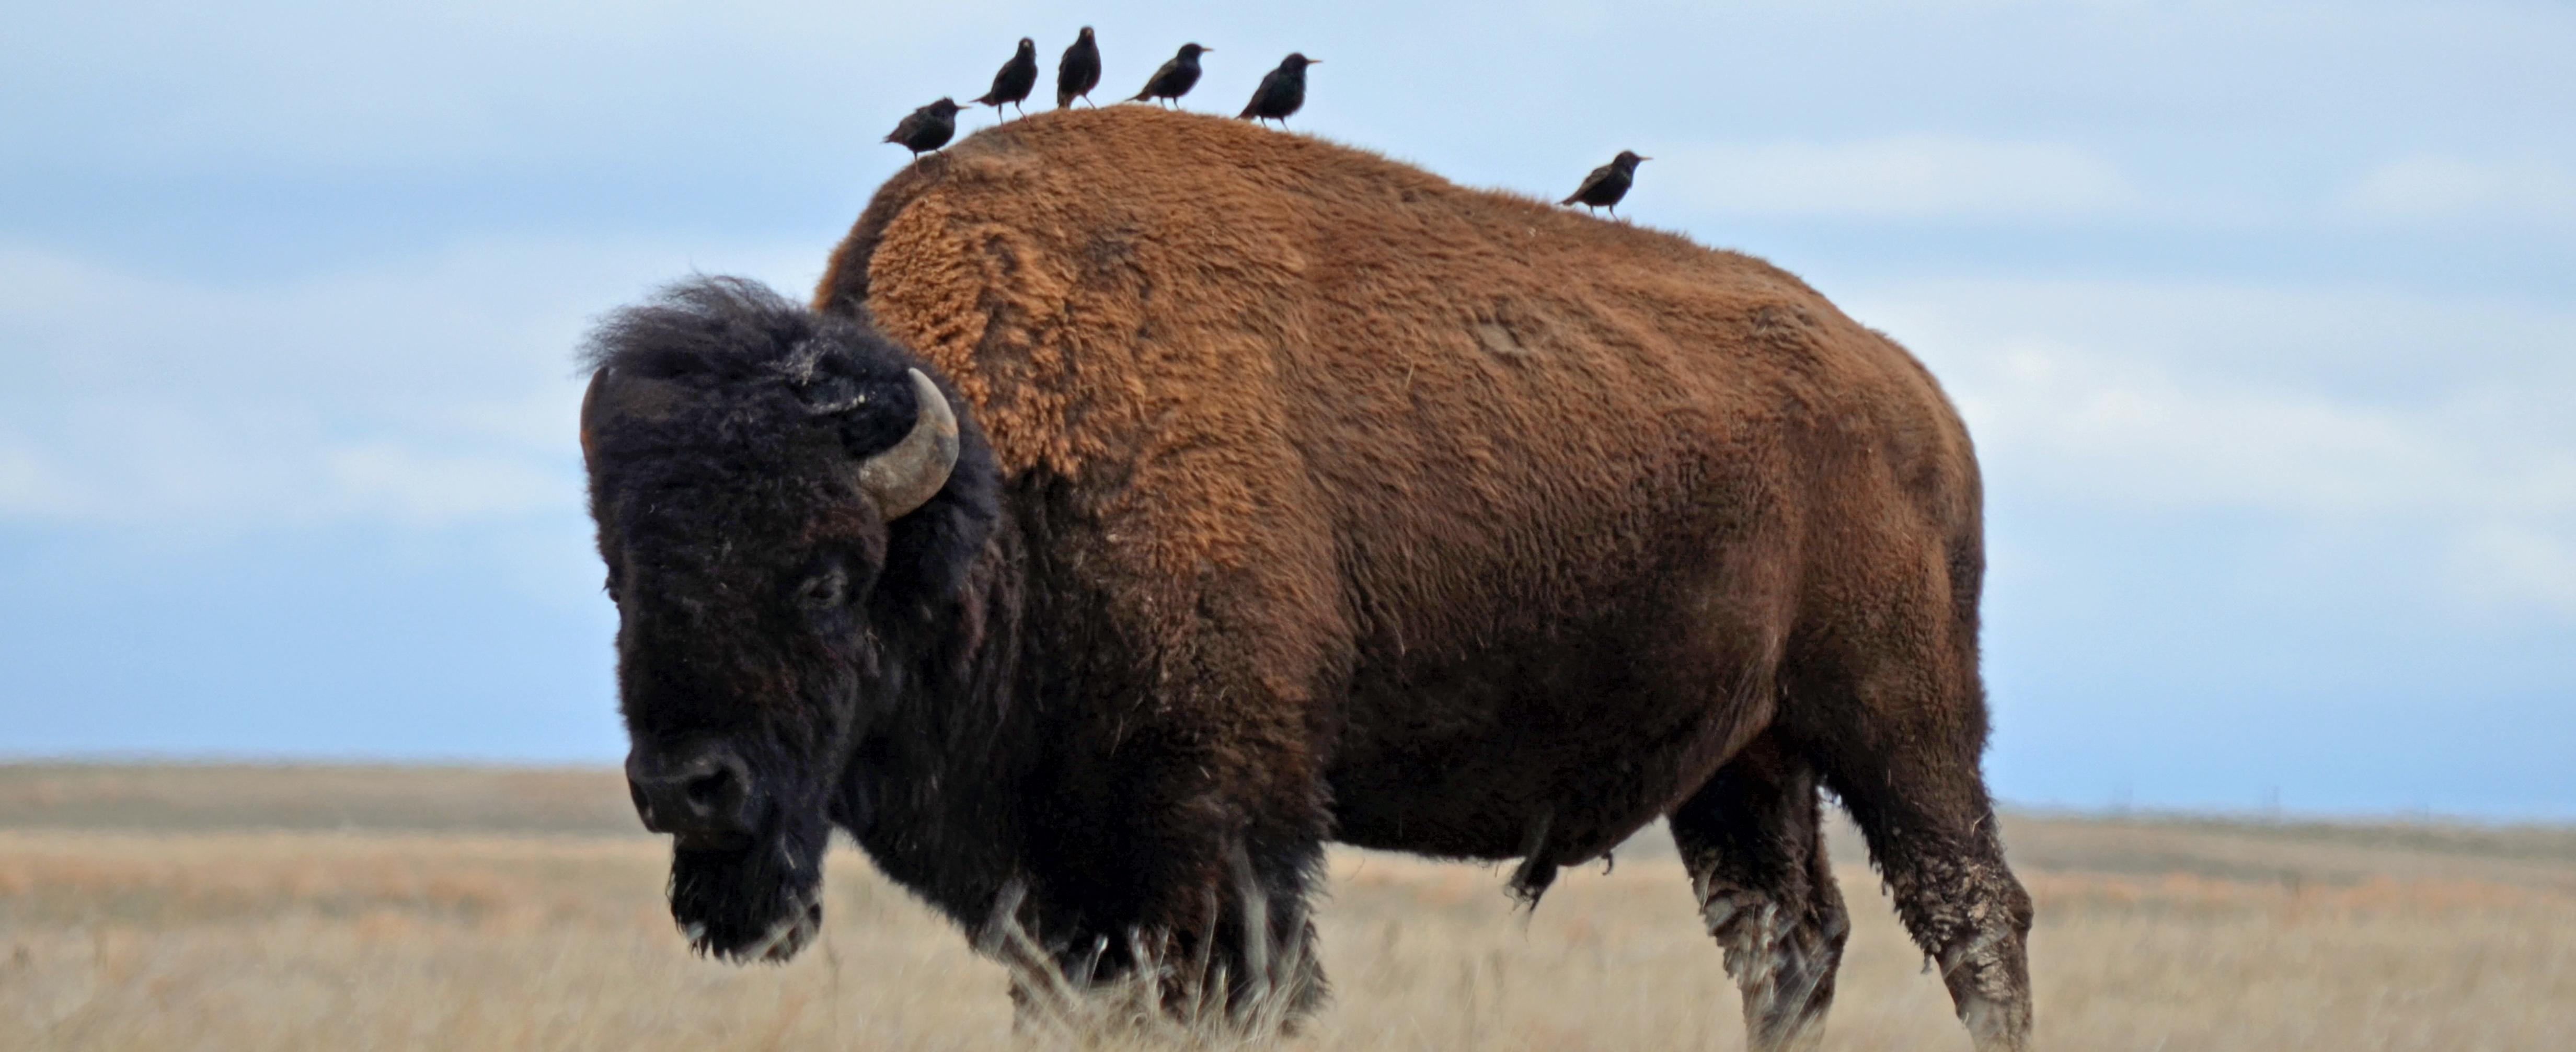 bison buffalo bison bison